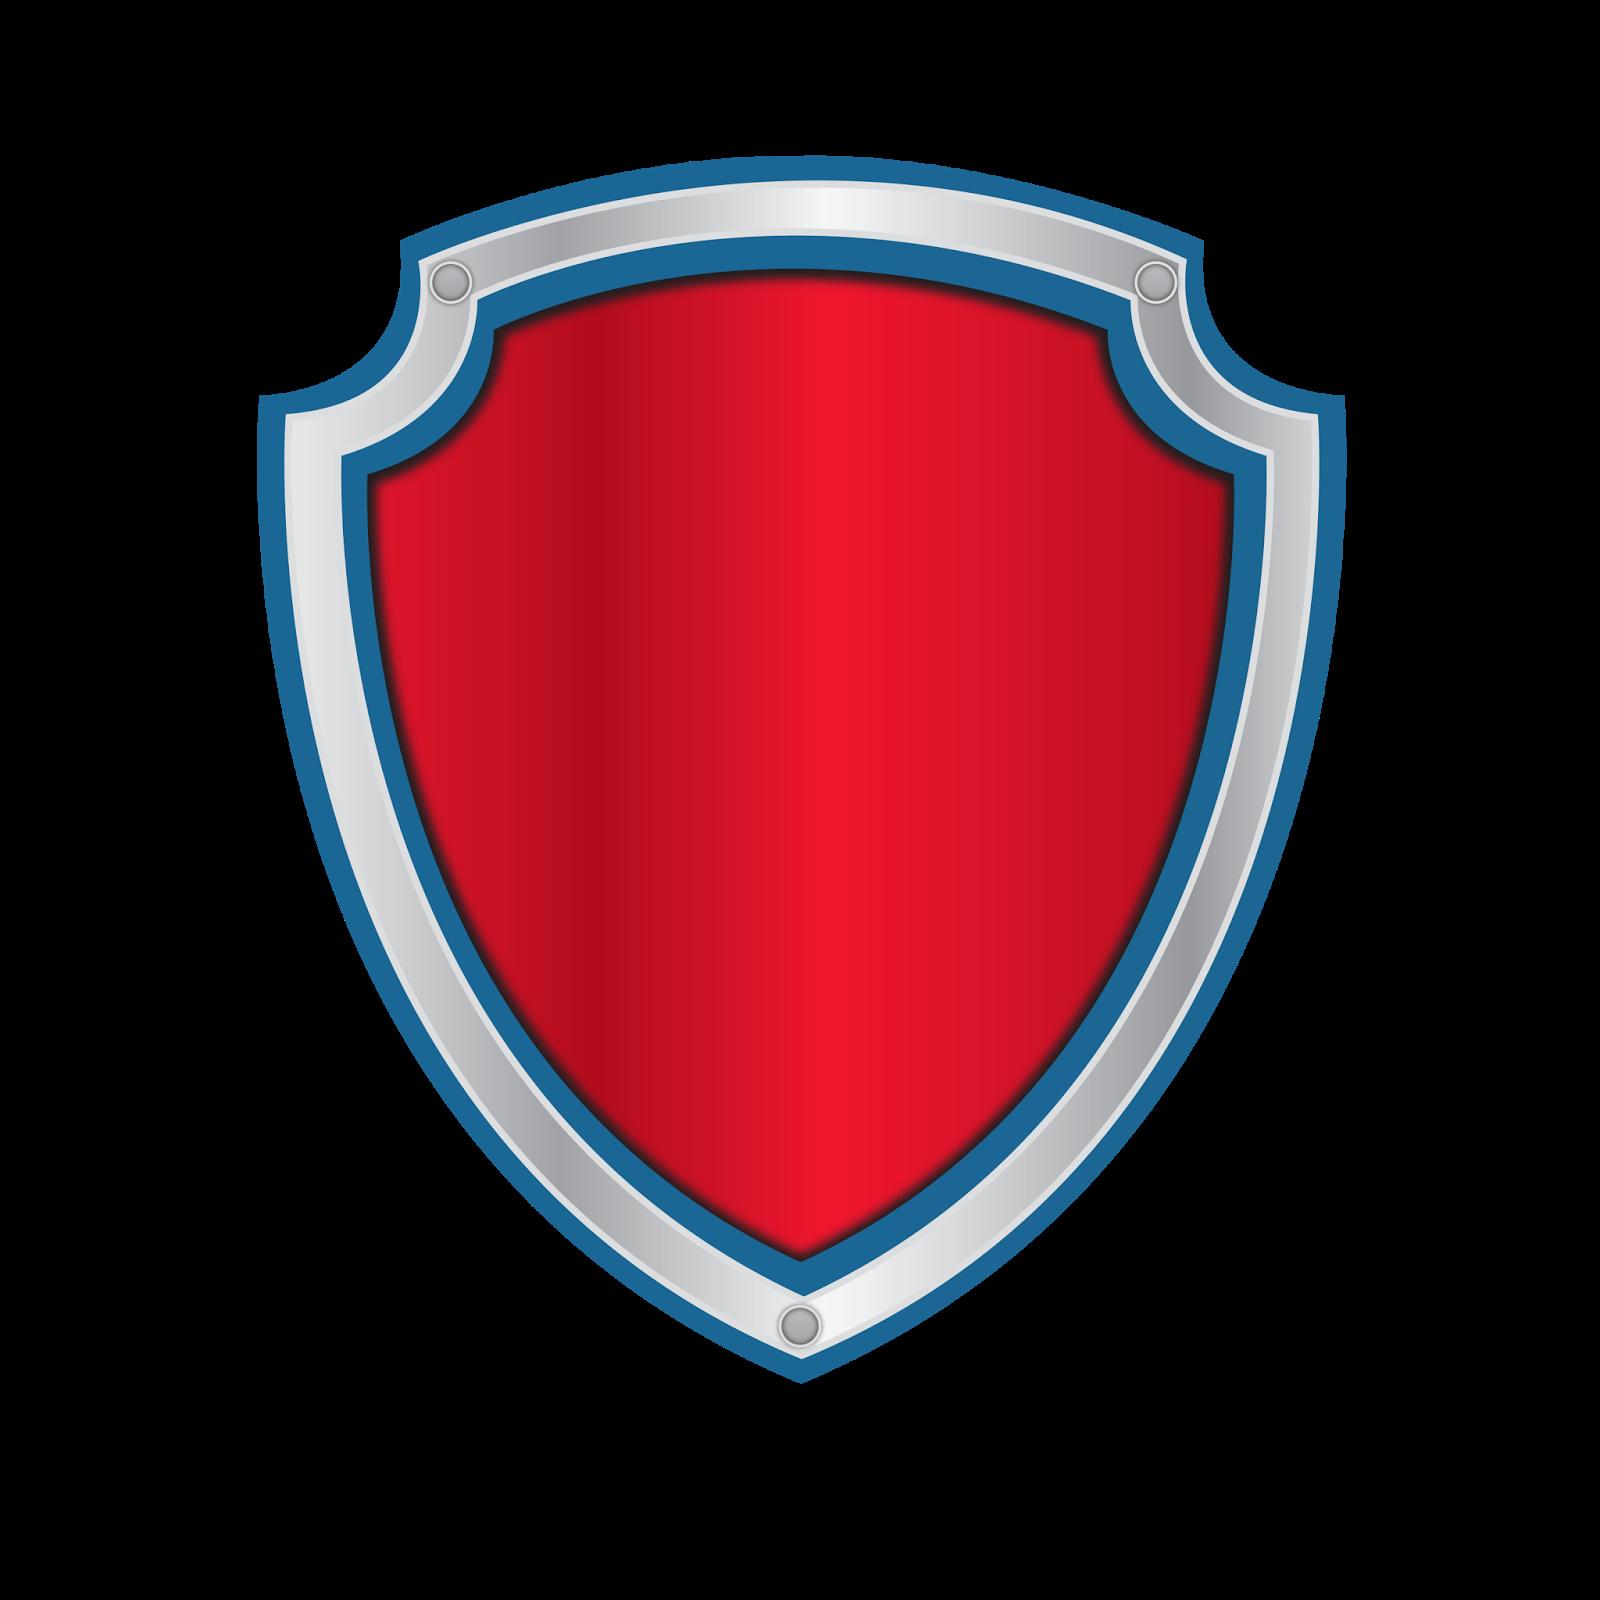 Alfabeto para Escudos de Paw Patrol para Imprimir Gratis..